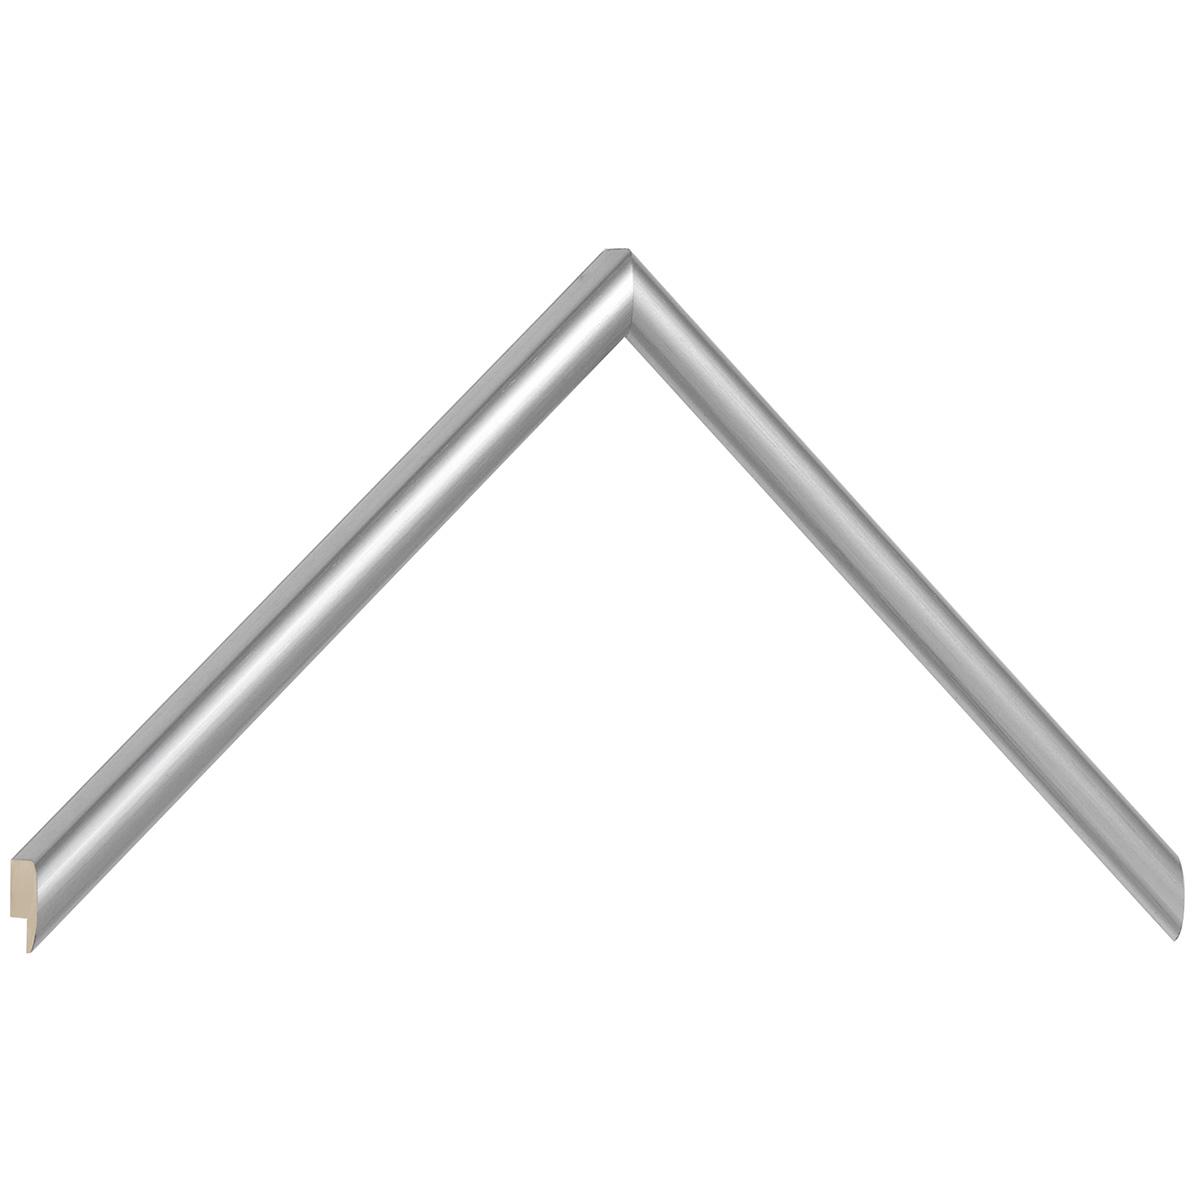 Moulding ramin - width 11mm height 13 - silver